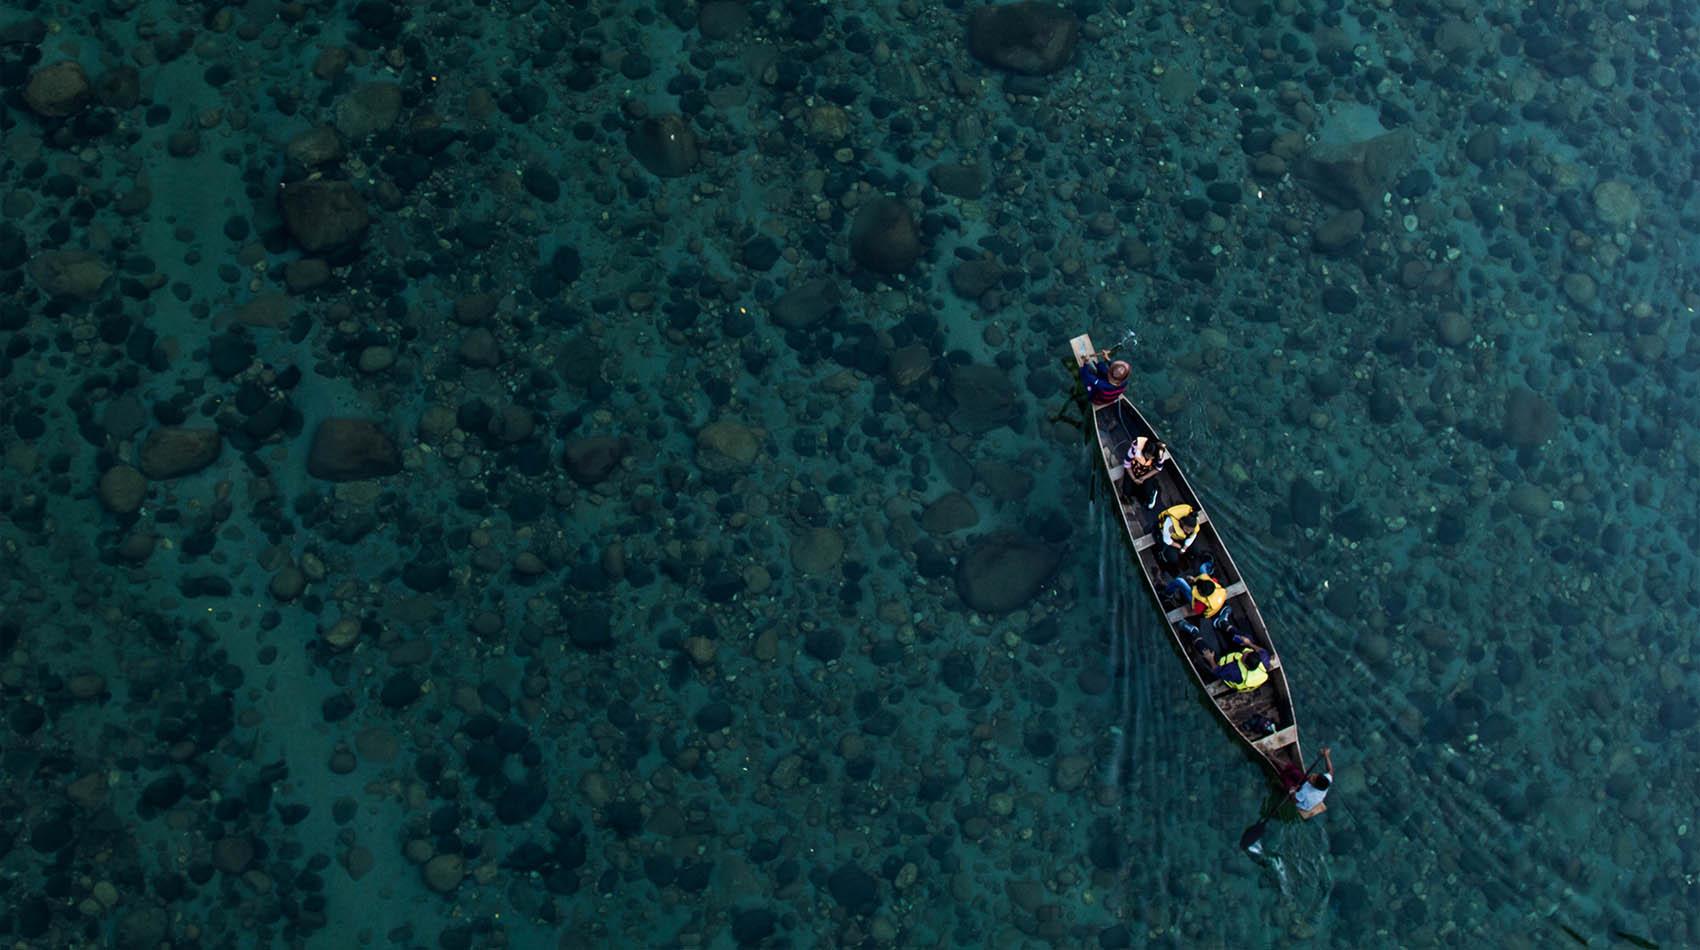 Meghalaya Slide